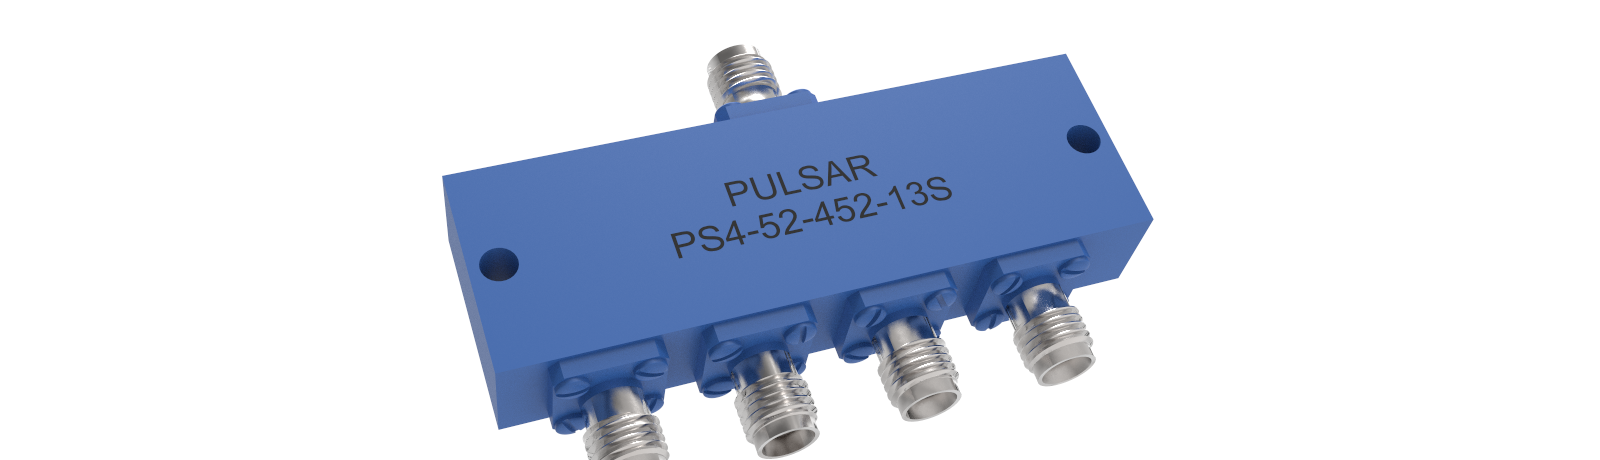 Image Pulsar Microwave 1